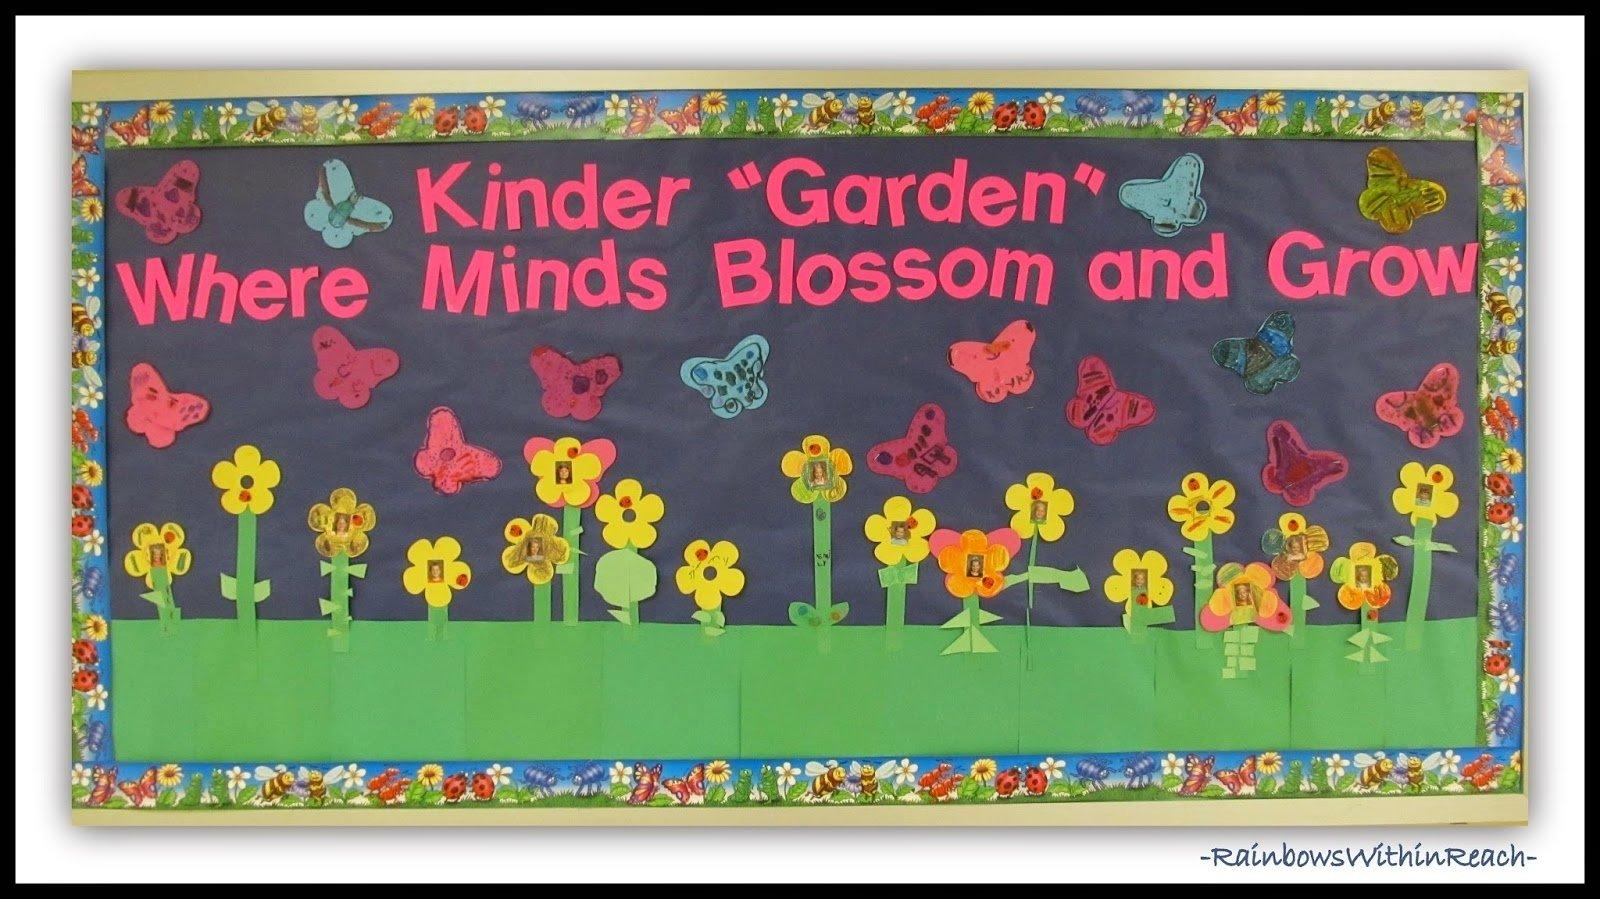 10 Gorgeous Bulletin Board Ideas For Kindergarten www rainbowswithinreach blogspot 14 2020